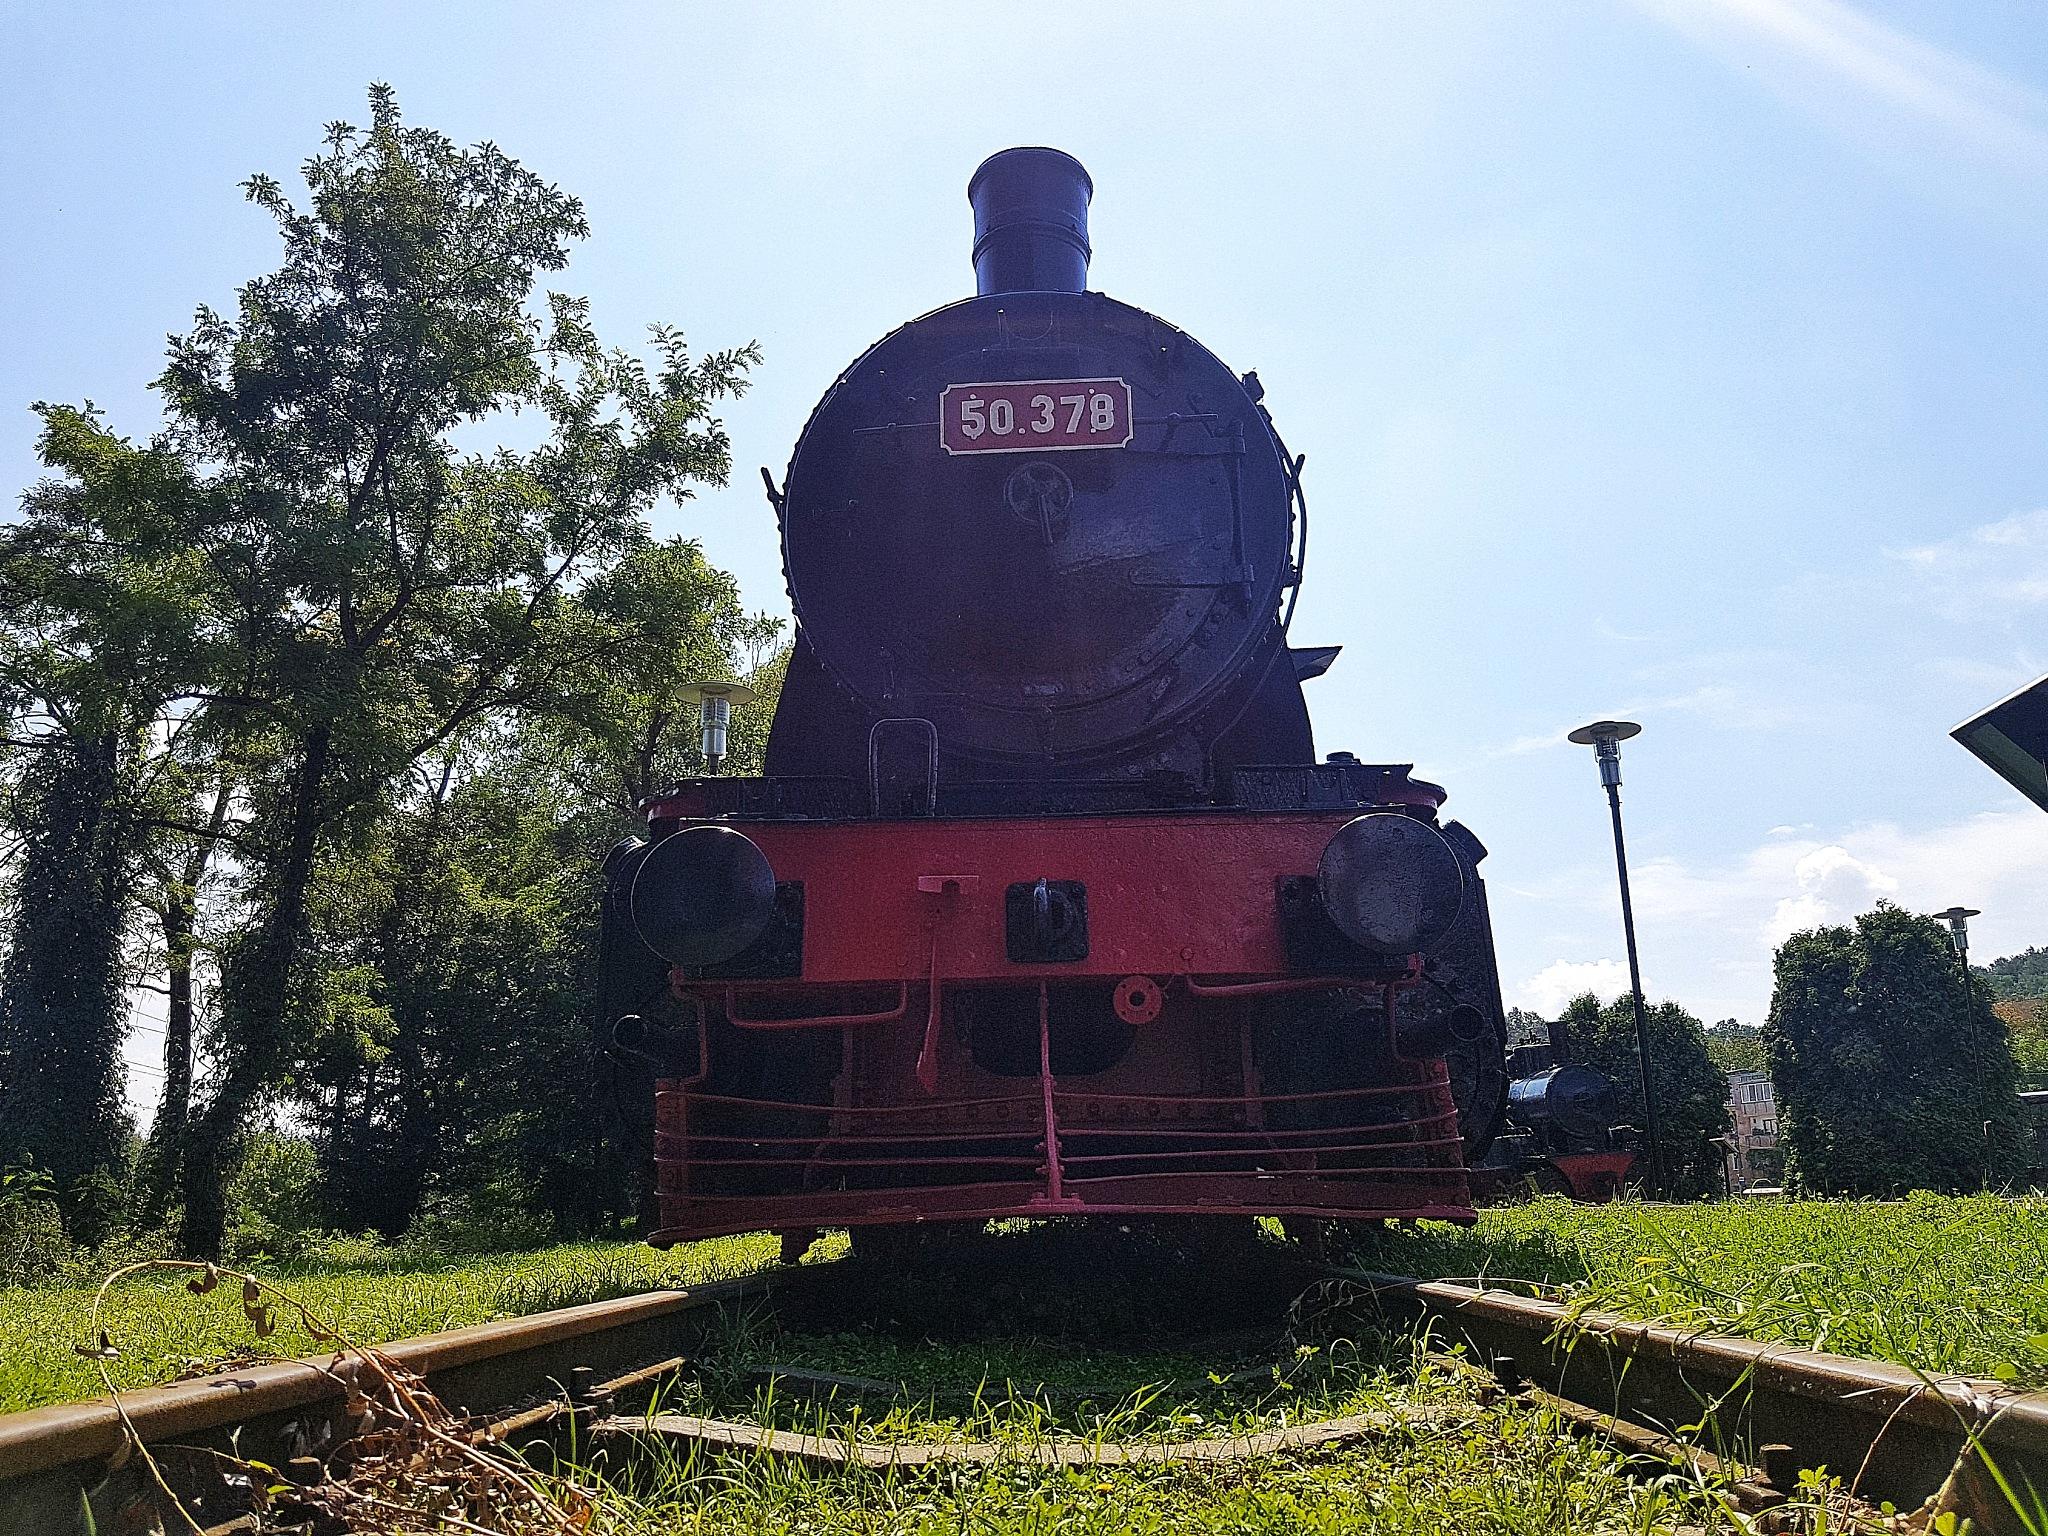 Steam locomotive by RihleaValentin